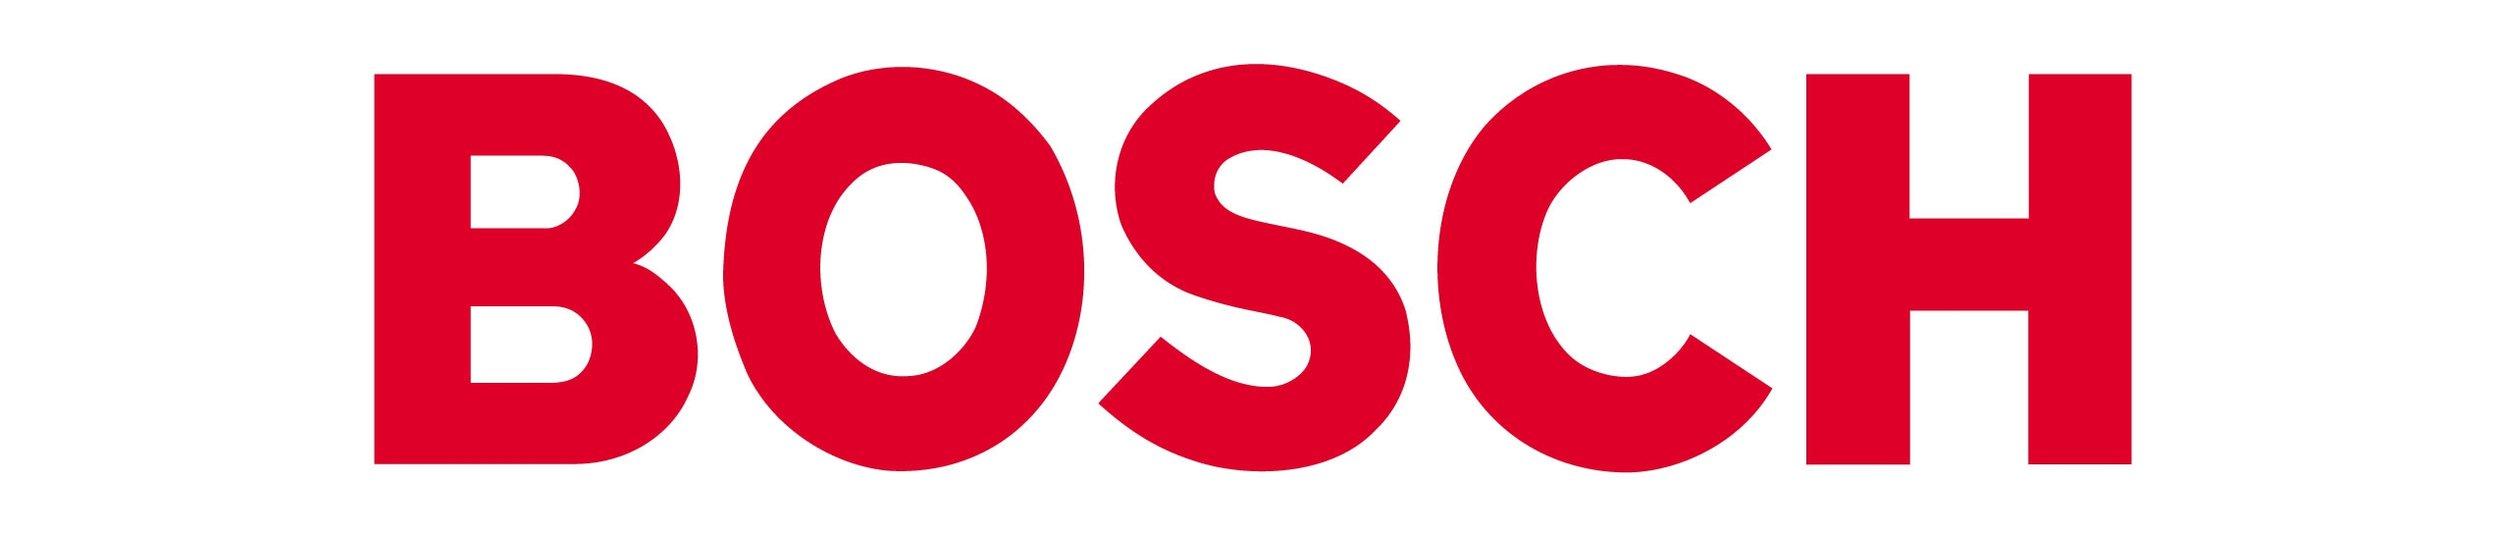 Bosch-Security-Logo.jpg